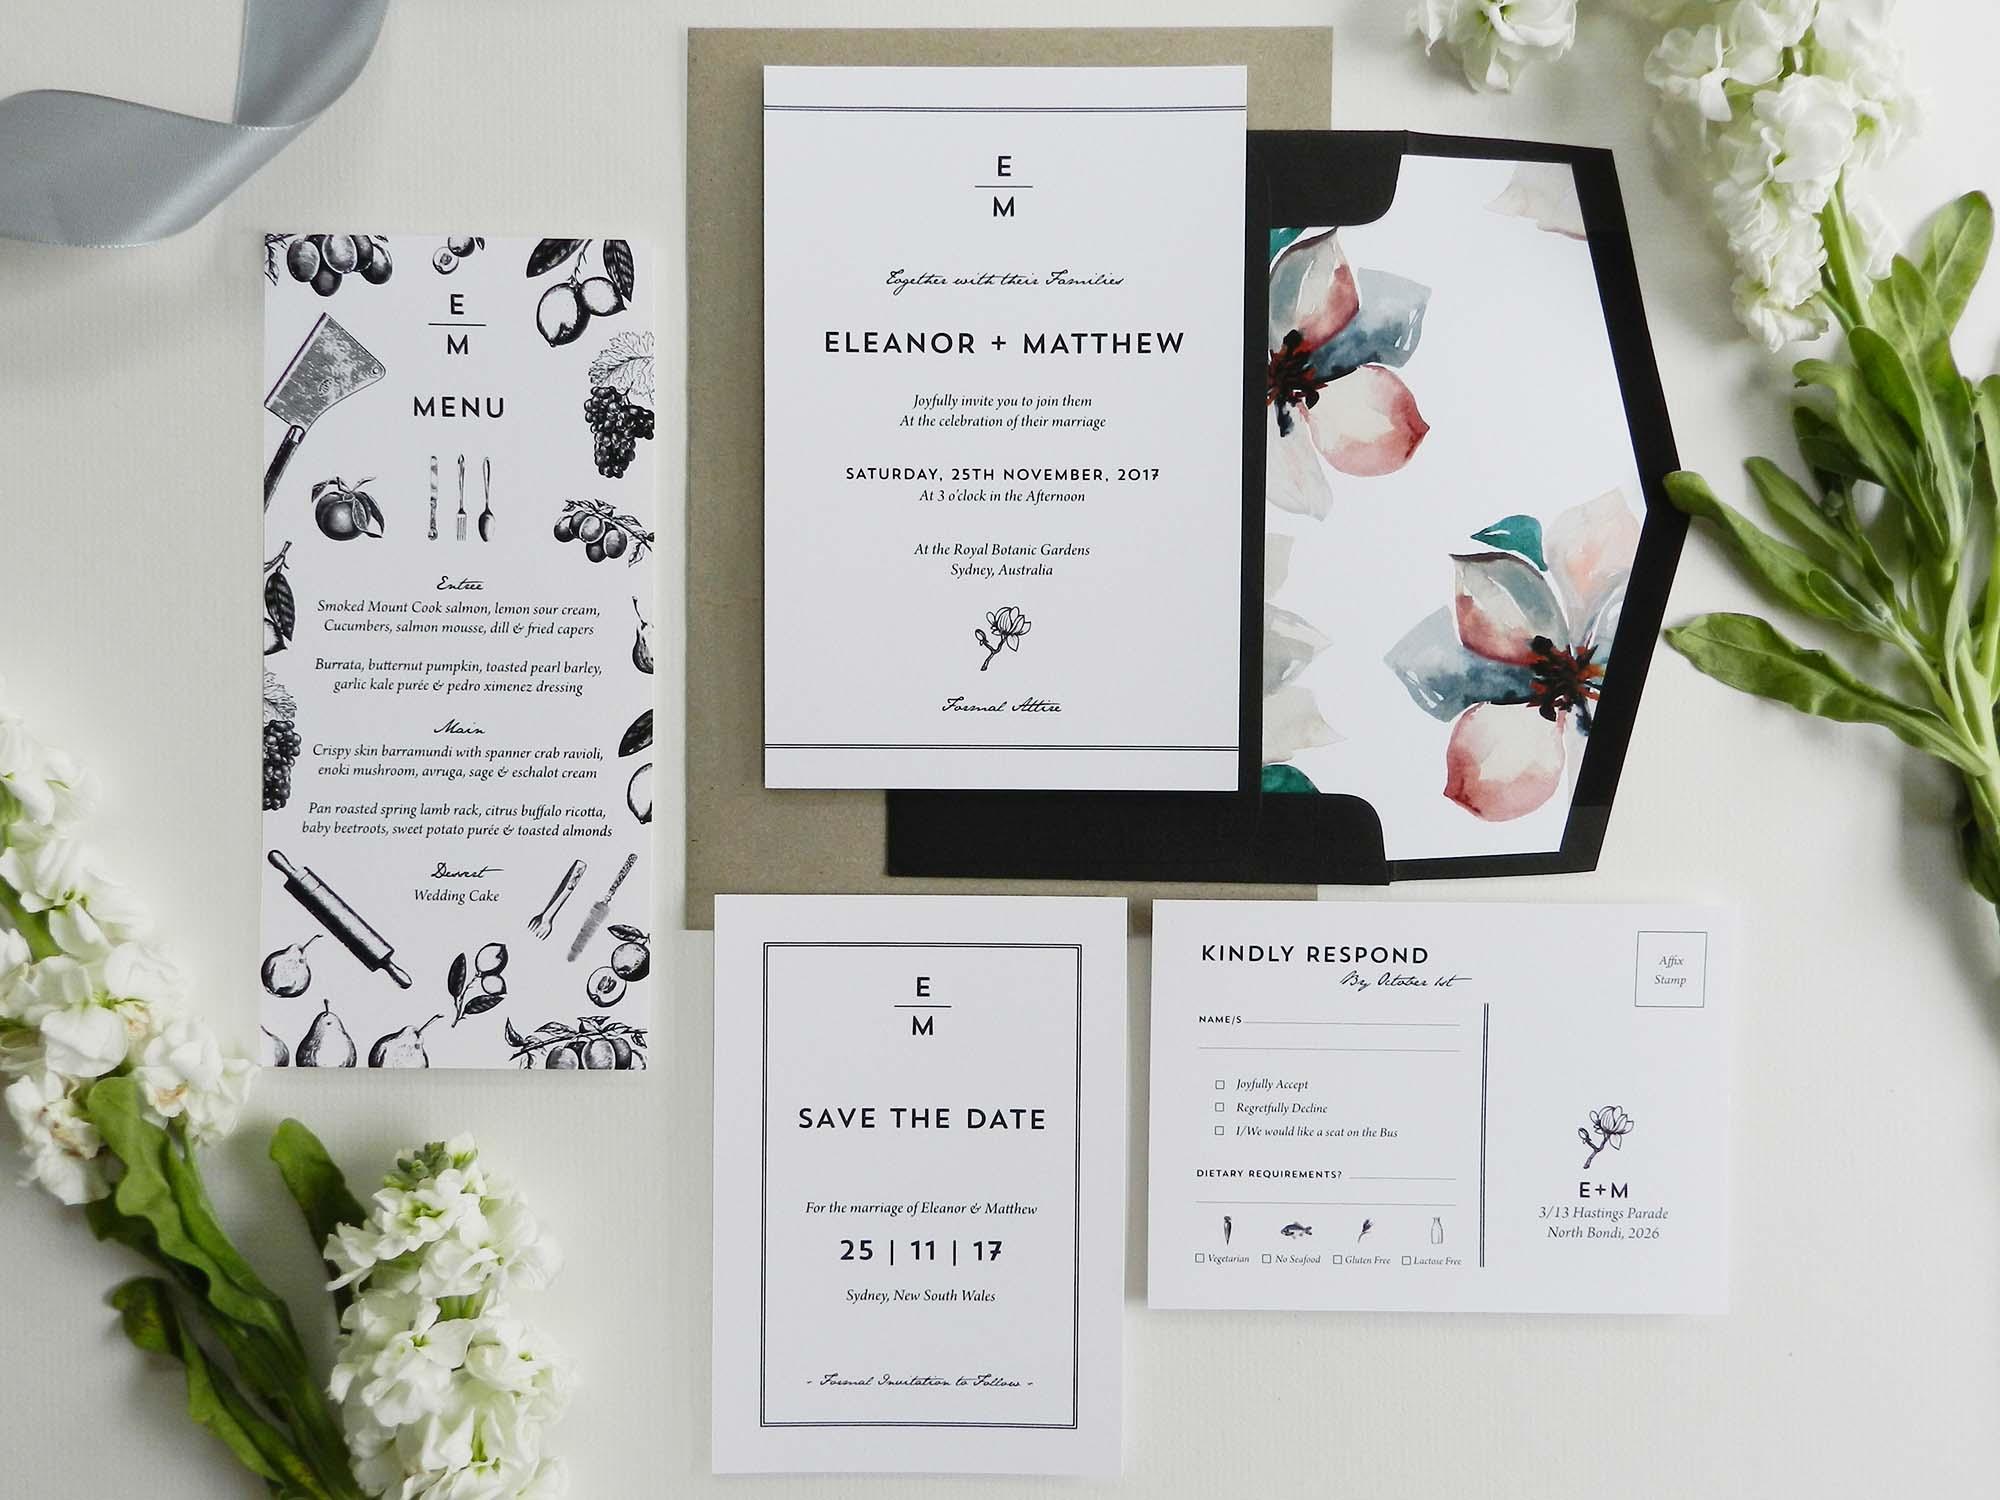 Magnolia_wedding_stationery_Invitation_design_with_paloma.jpg